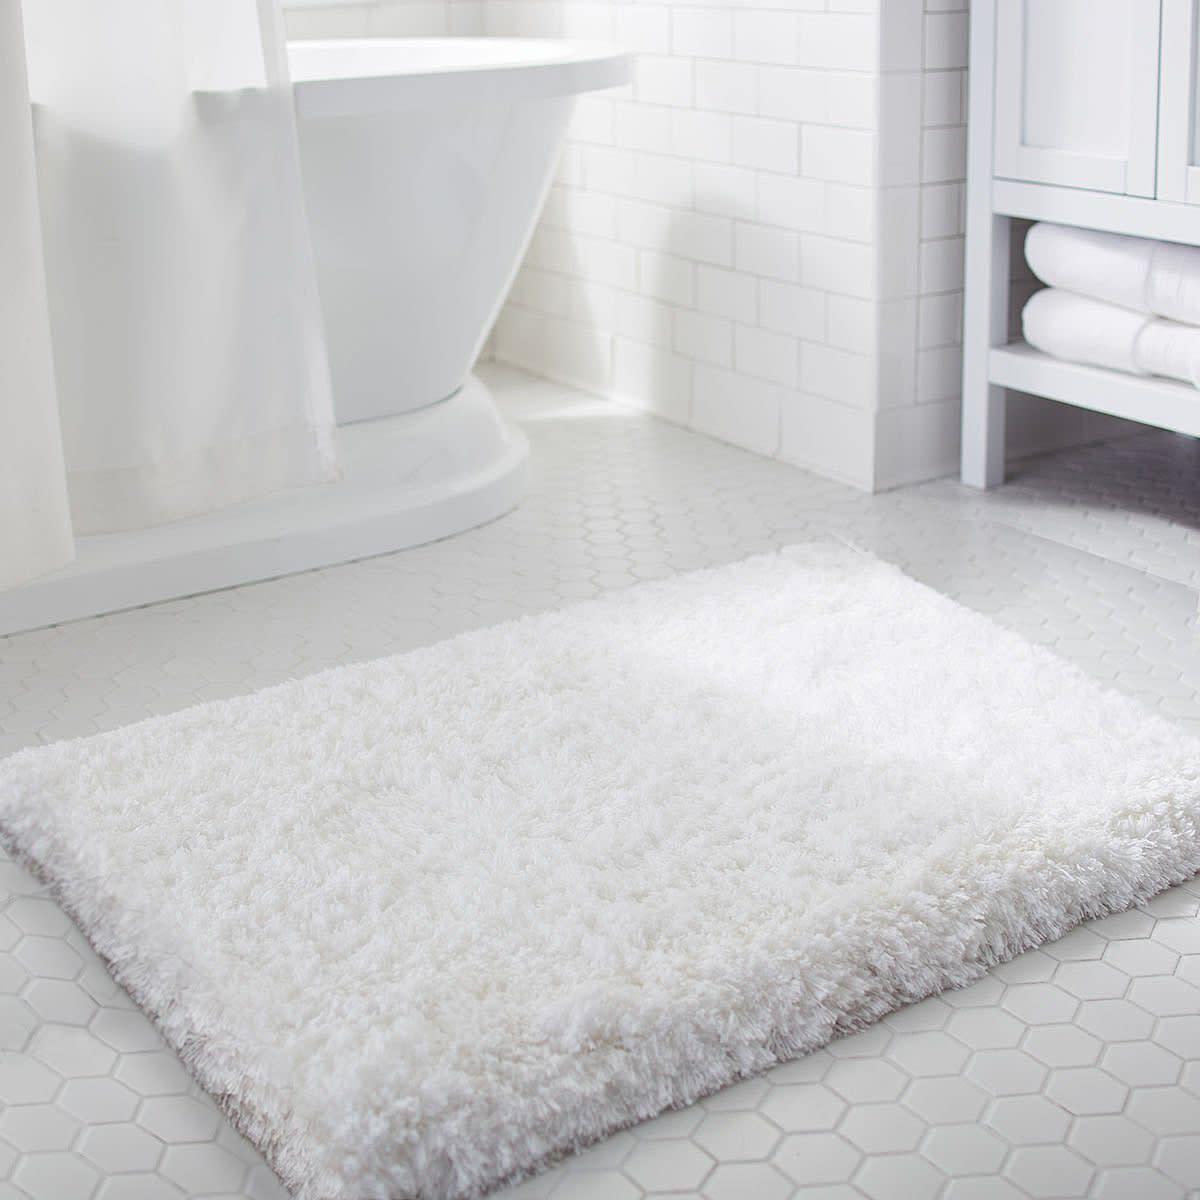 Soft Shaggy Bath Mat Non-slip Rubber Bathroom Rug White Floor Mats ...